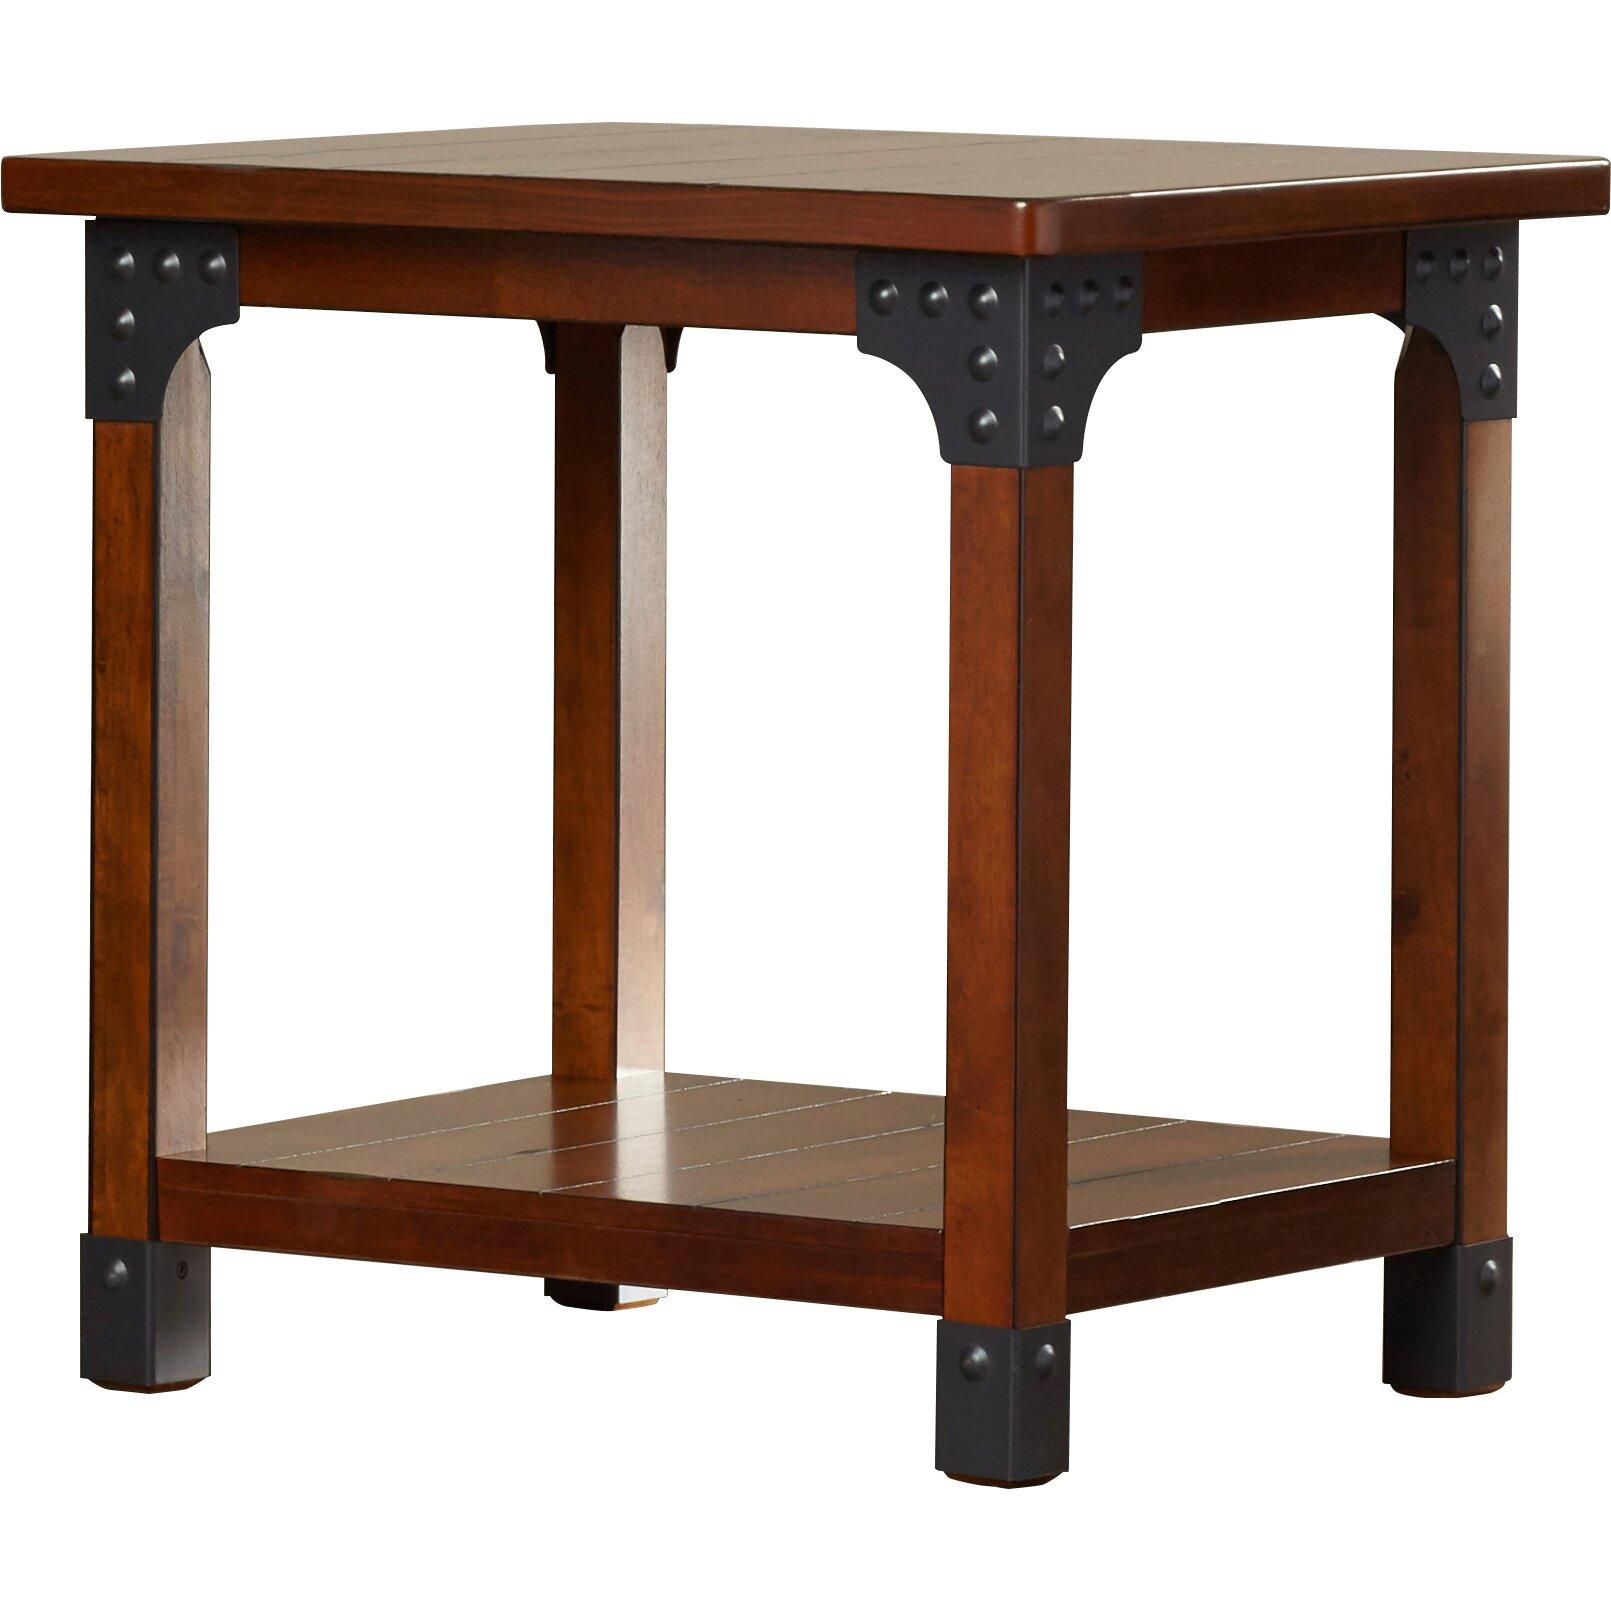 Hebbville Coffee Table Reviews: Loon Peak Penrose-Portland 3 Piece Coffee Table Set